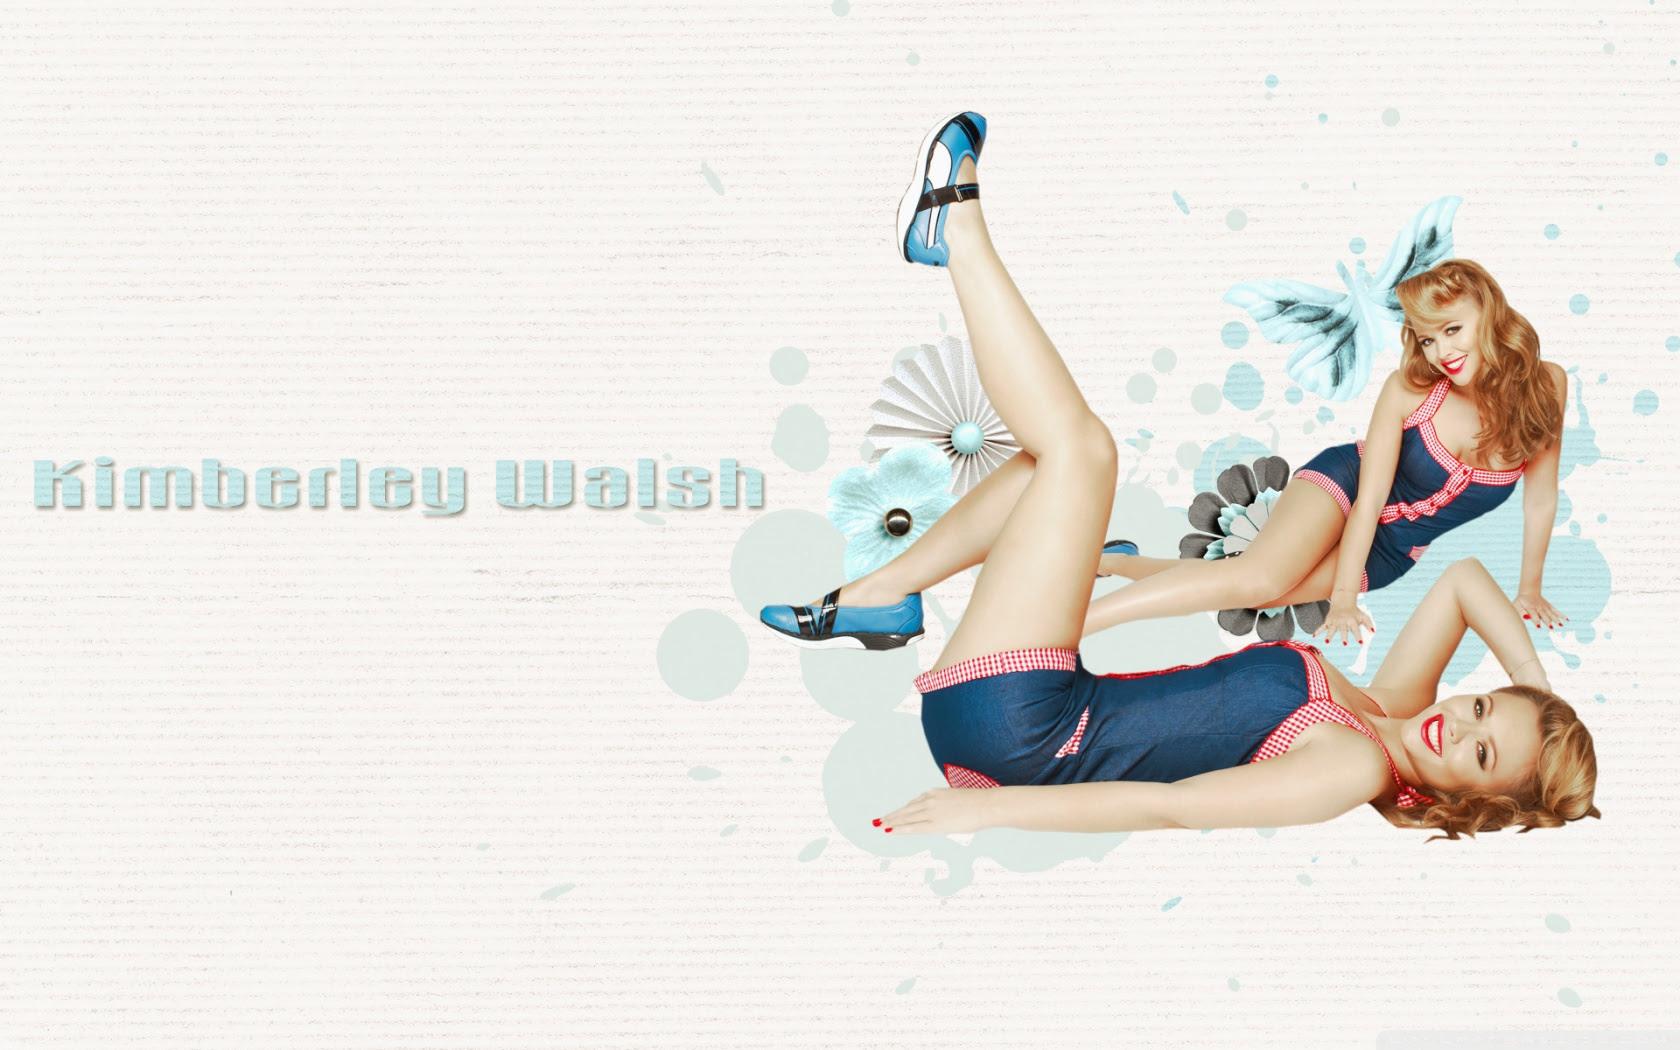 Kimberley Walsh Pin Up Girl Ultra Hd Desktop Background Wallpaper